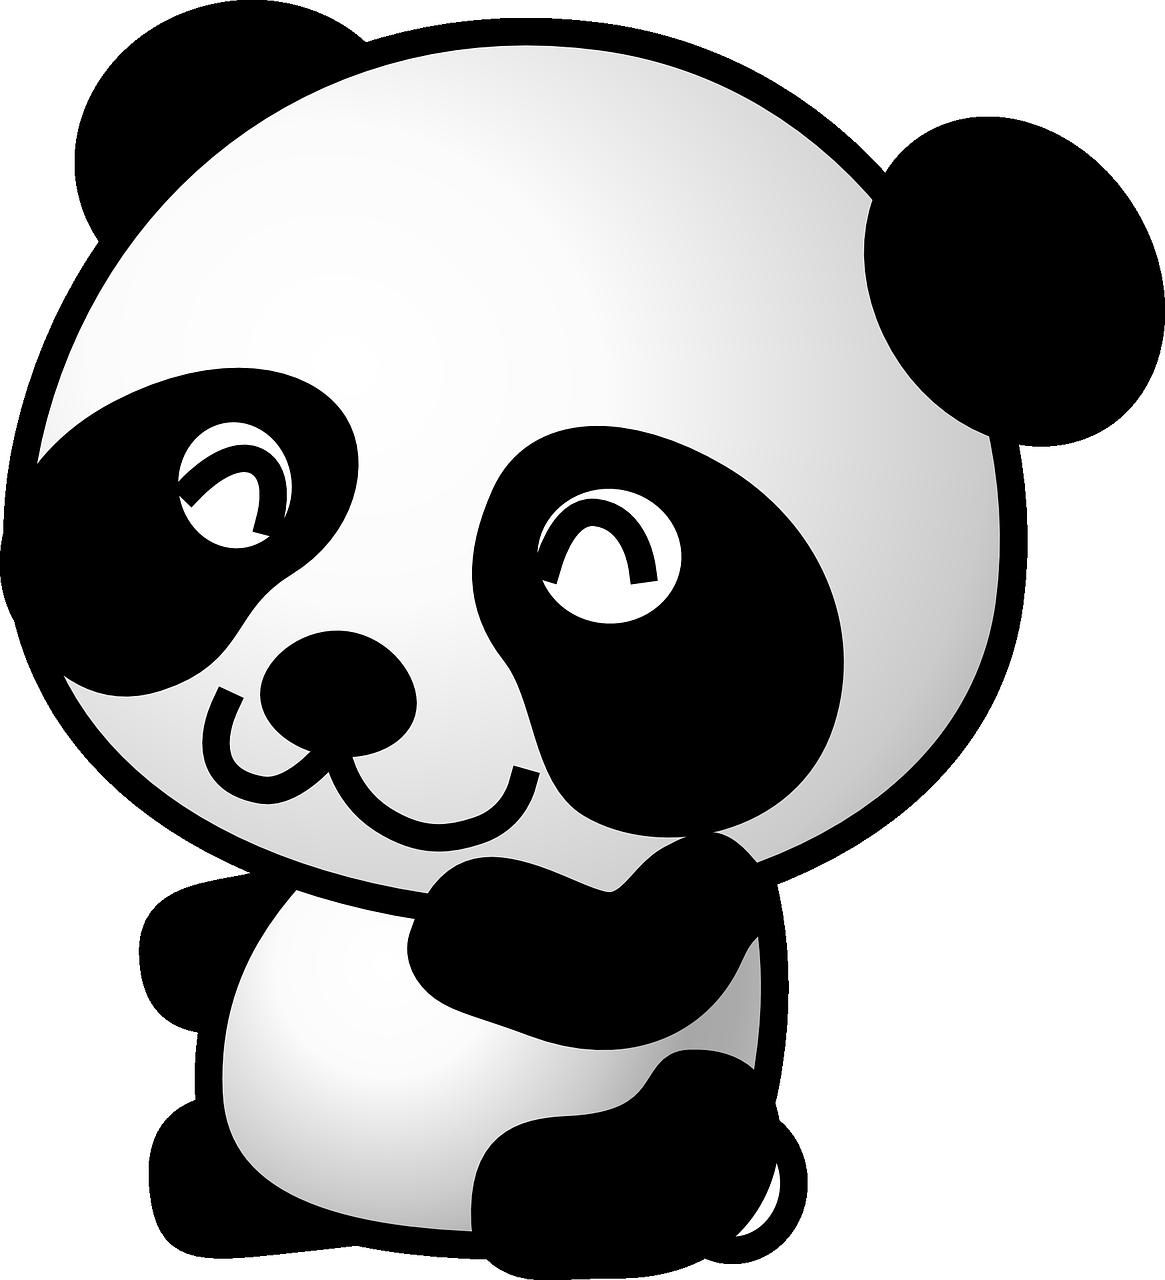 Panda Stickers - 2018 messages sticker-1